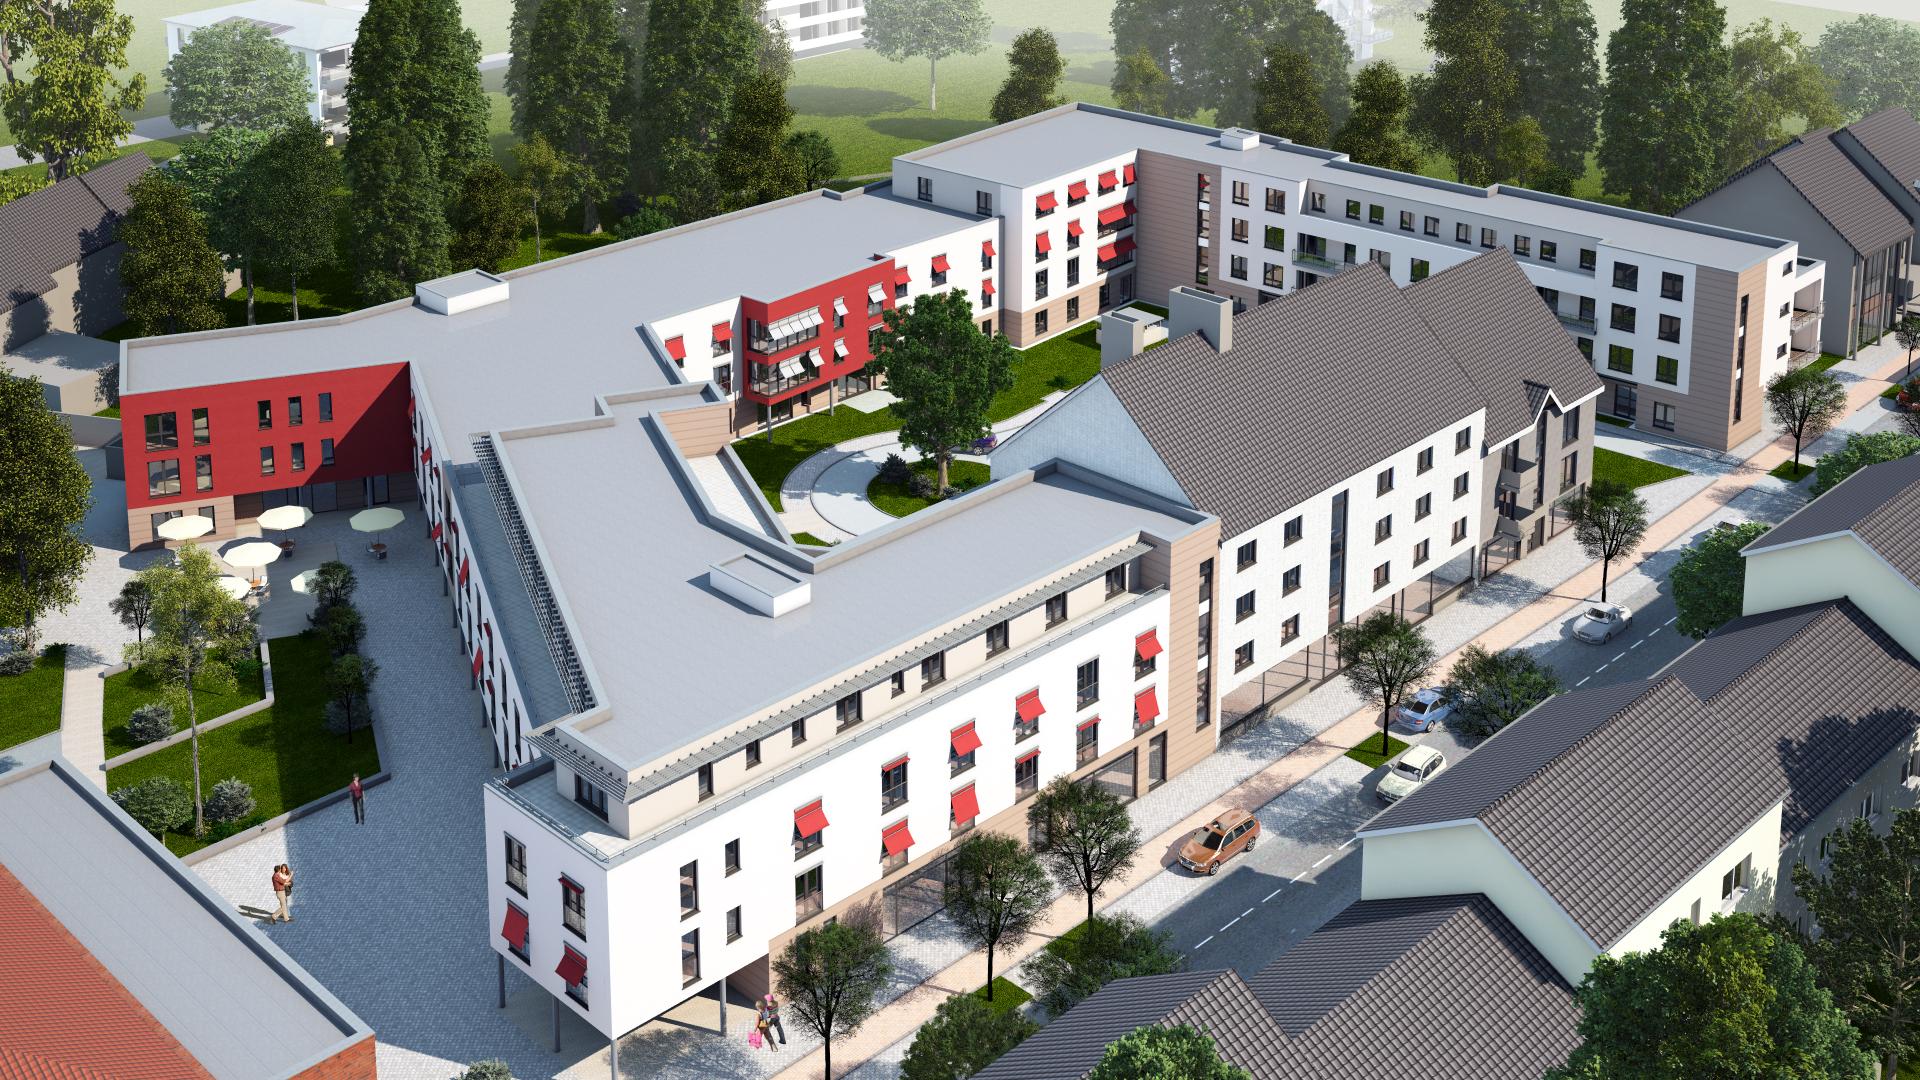 Seniorenheim Alsdorf